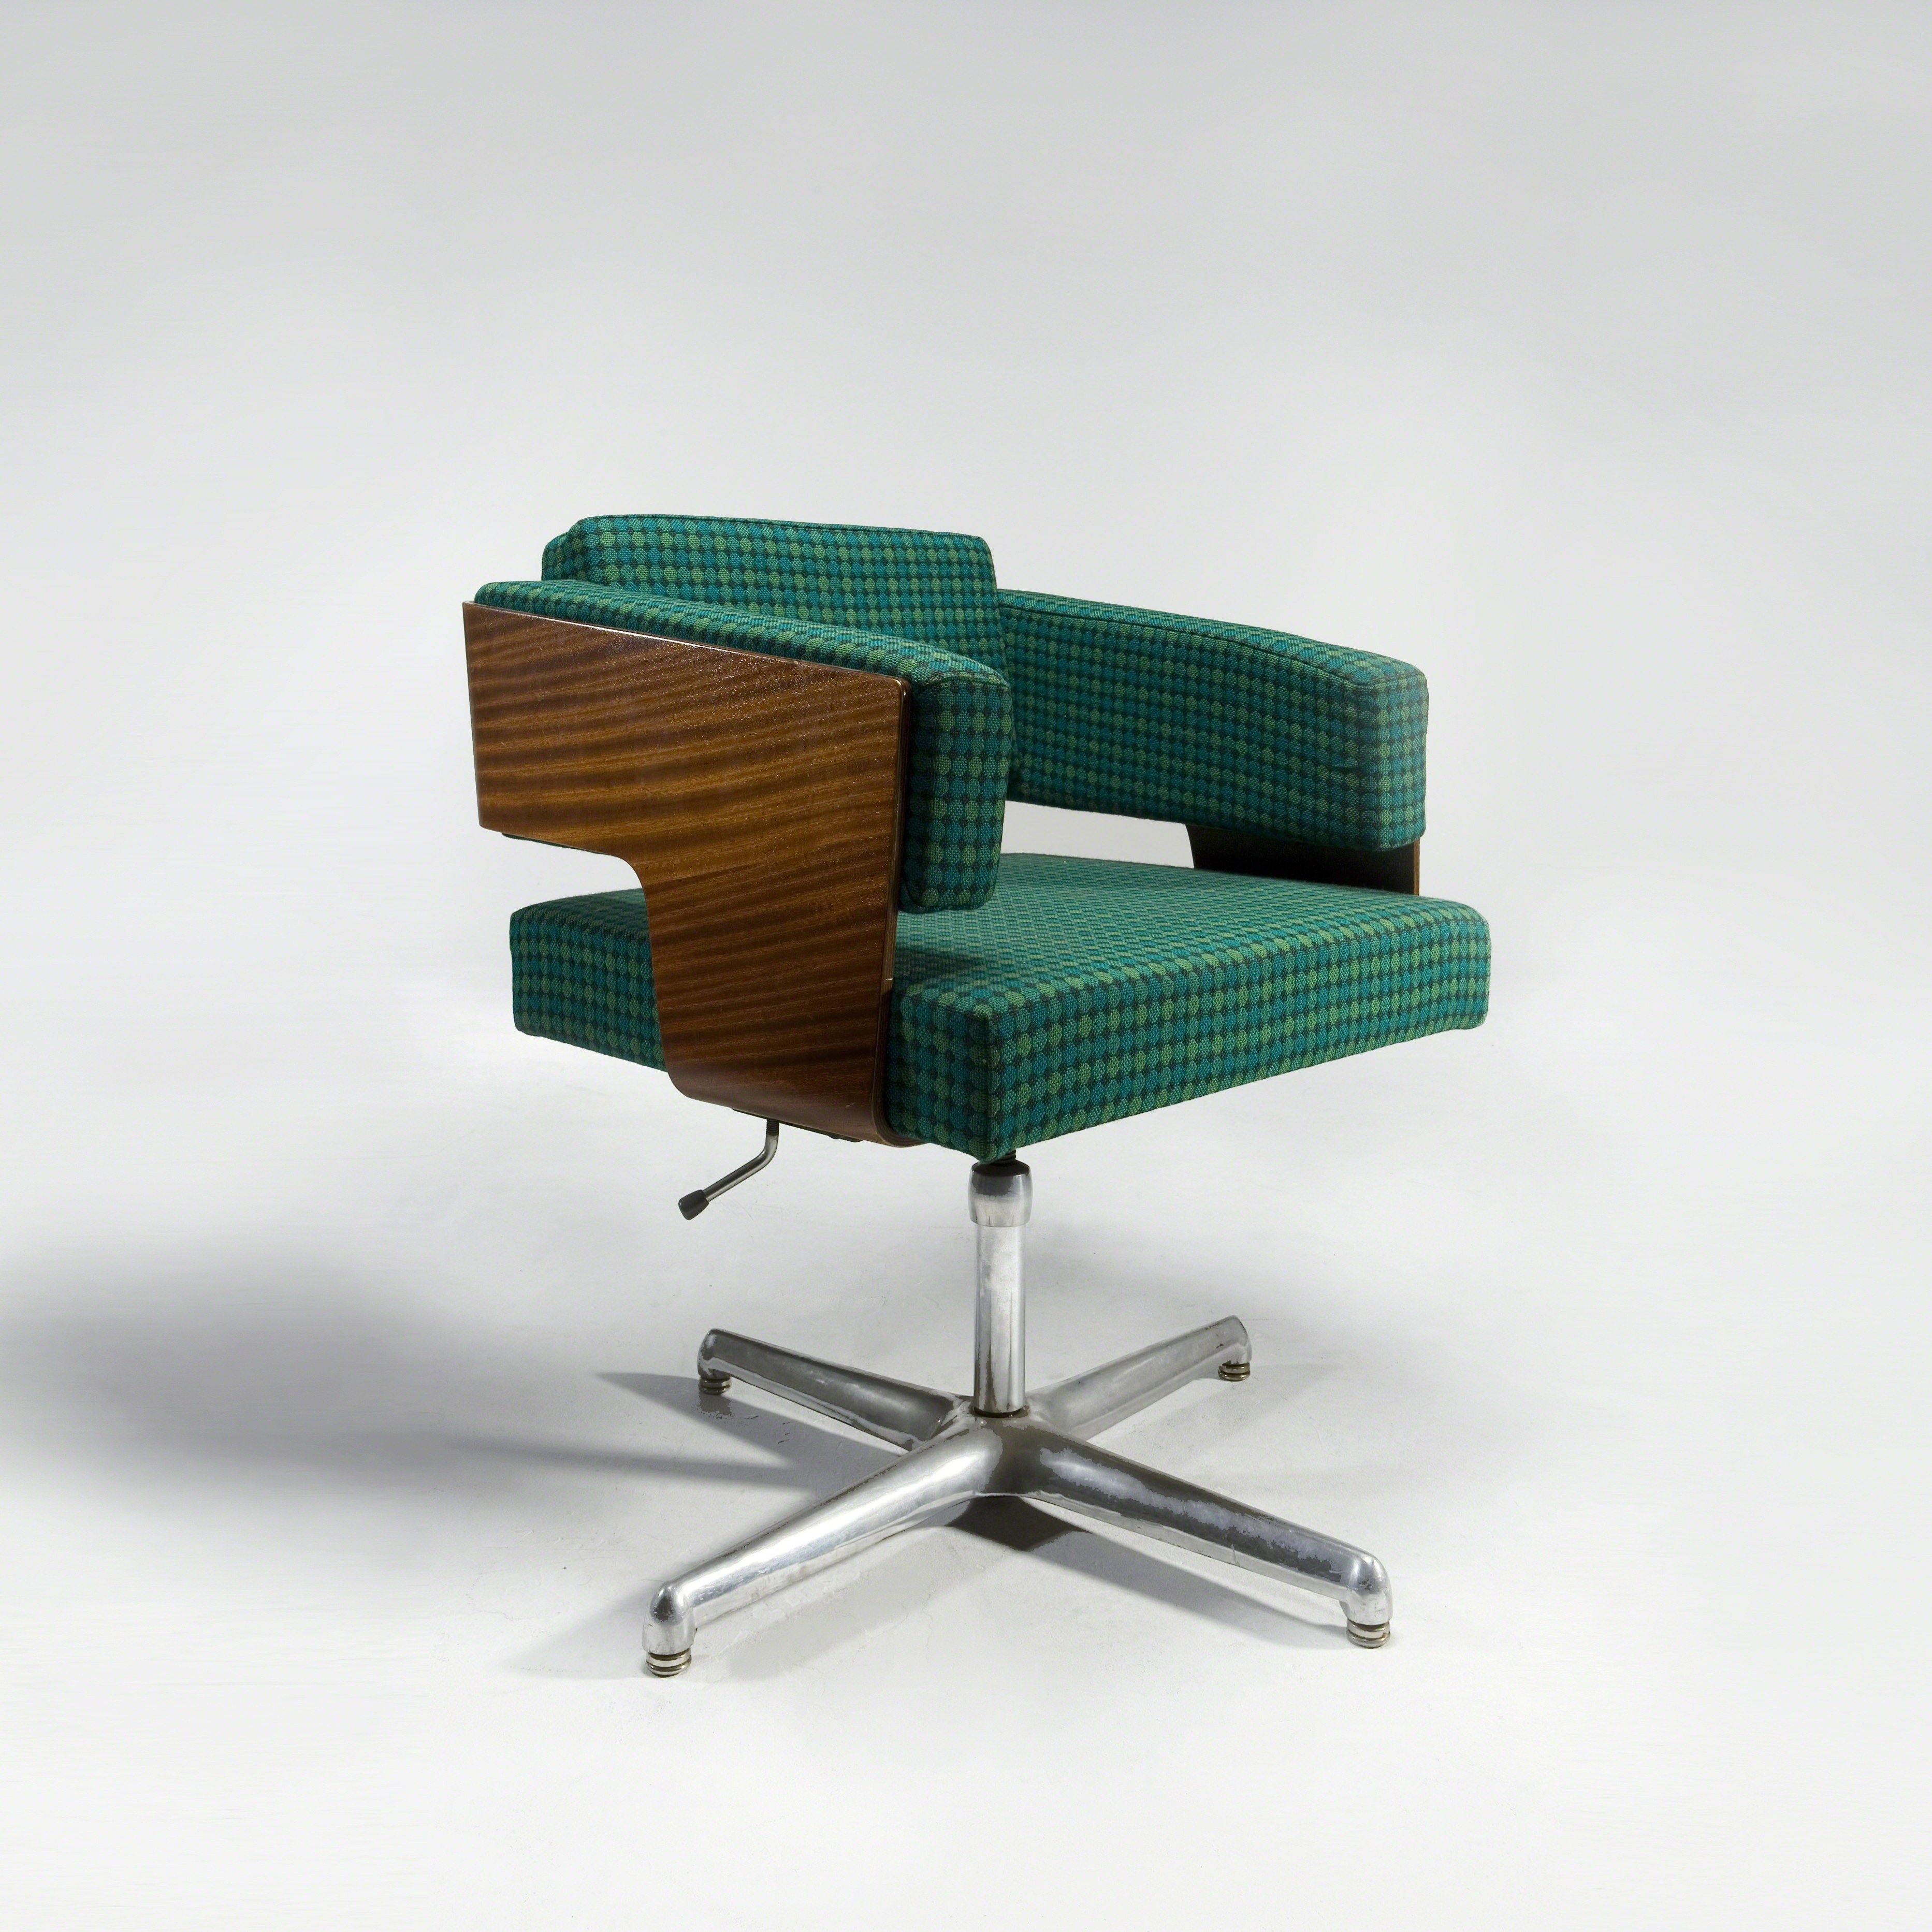 , ''Confort' Desk Chair, Model 3001 T8,' 1964, Demisch Danant